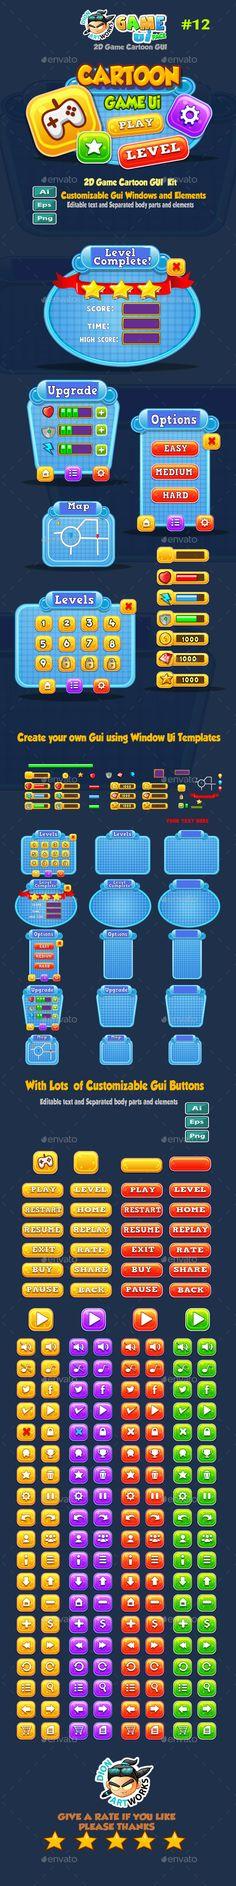 Cartoon Game UI Pack Vector EPS, Quark QXP, AI Illustrator. Download here…